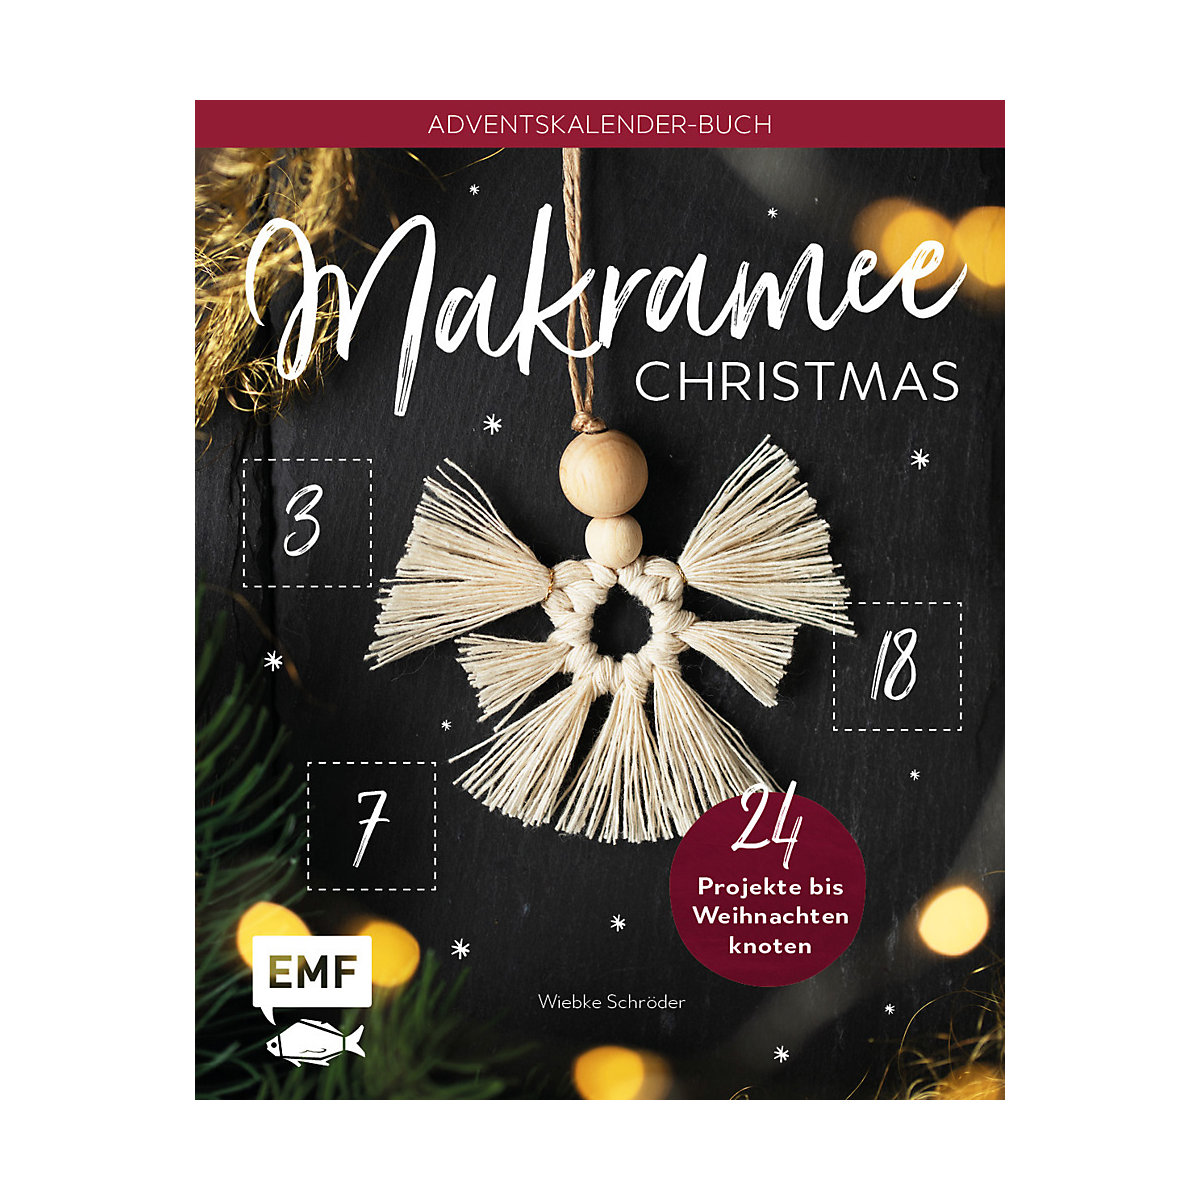 Mein Adventskalender-Buch: Makramee Christmas